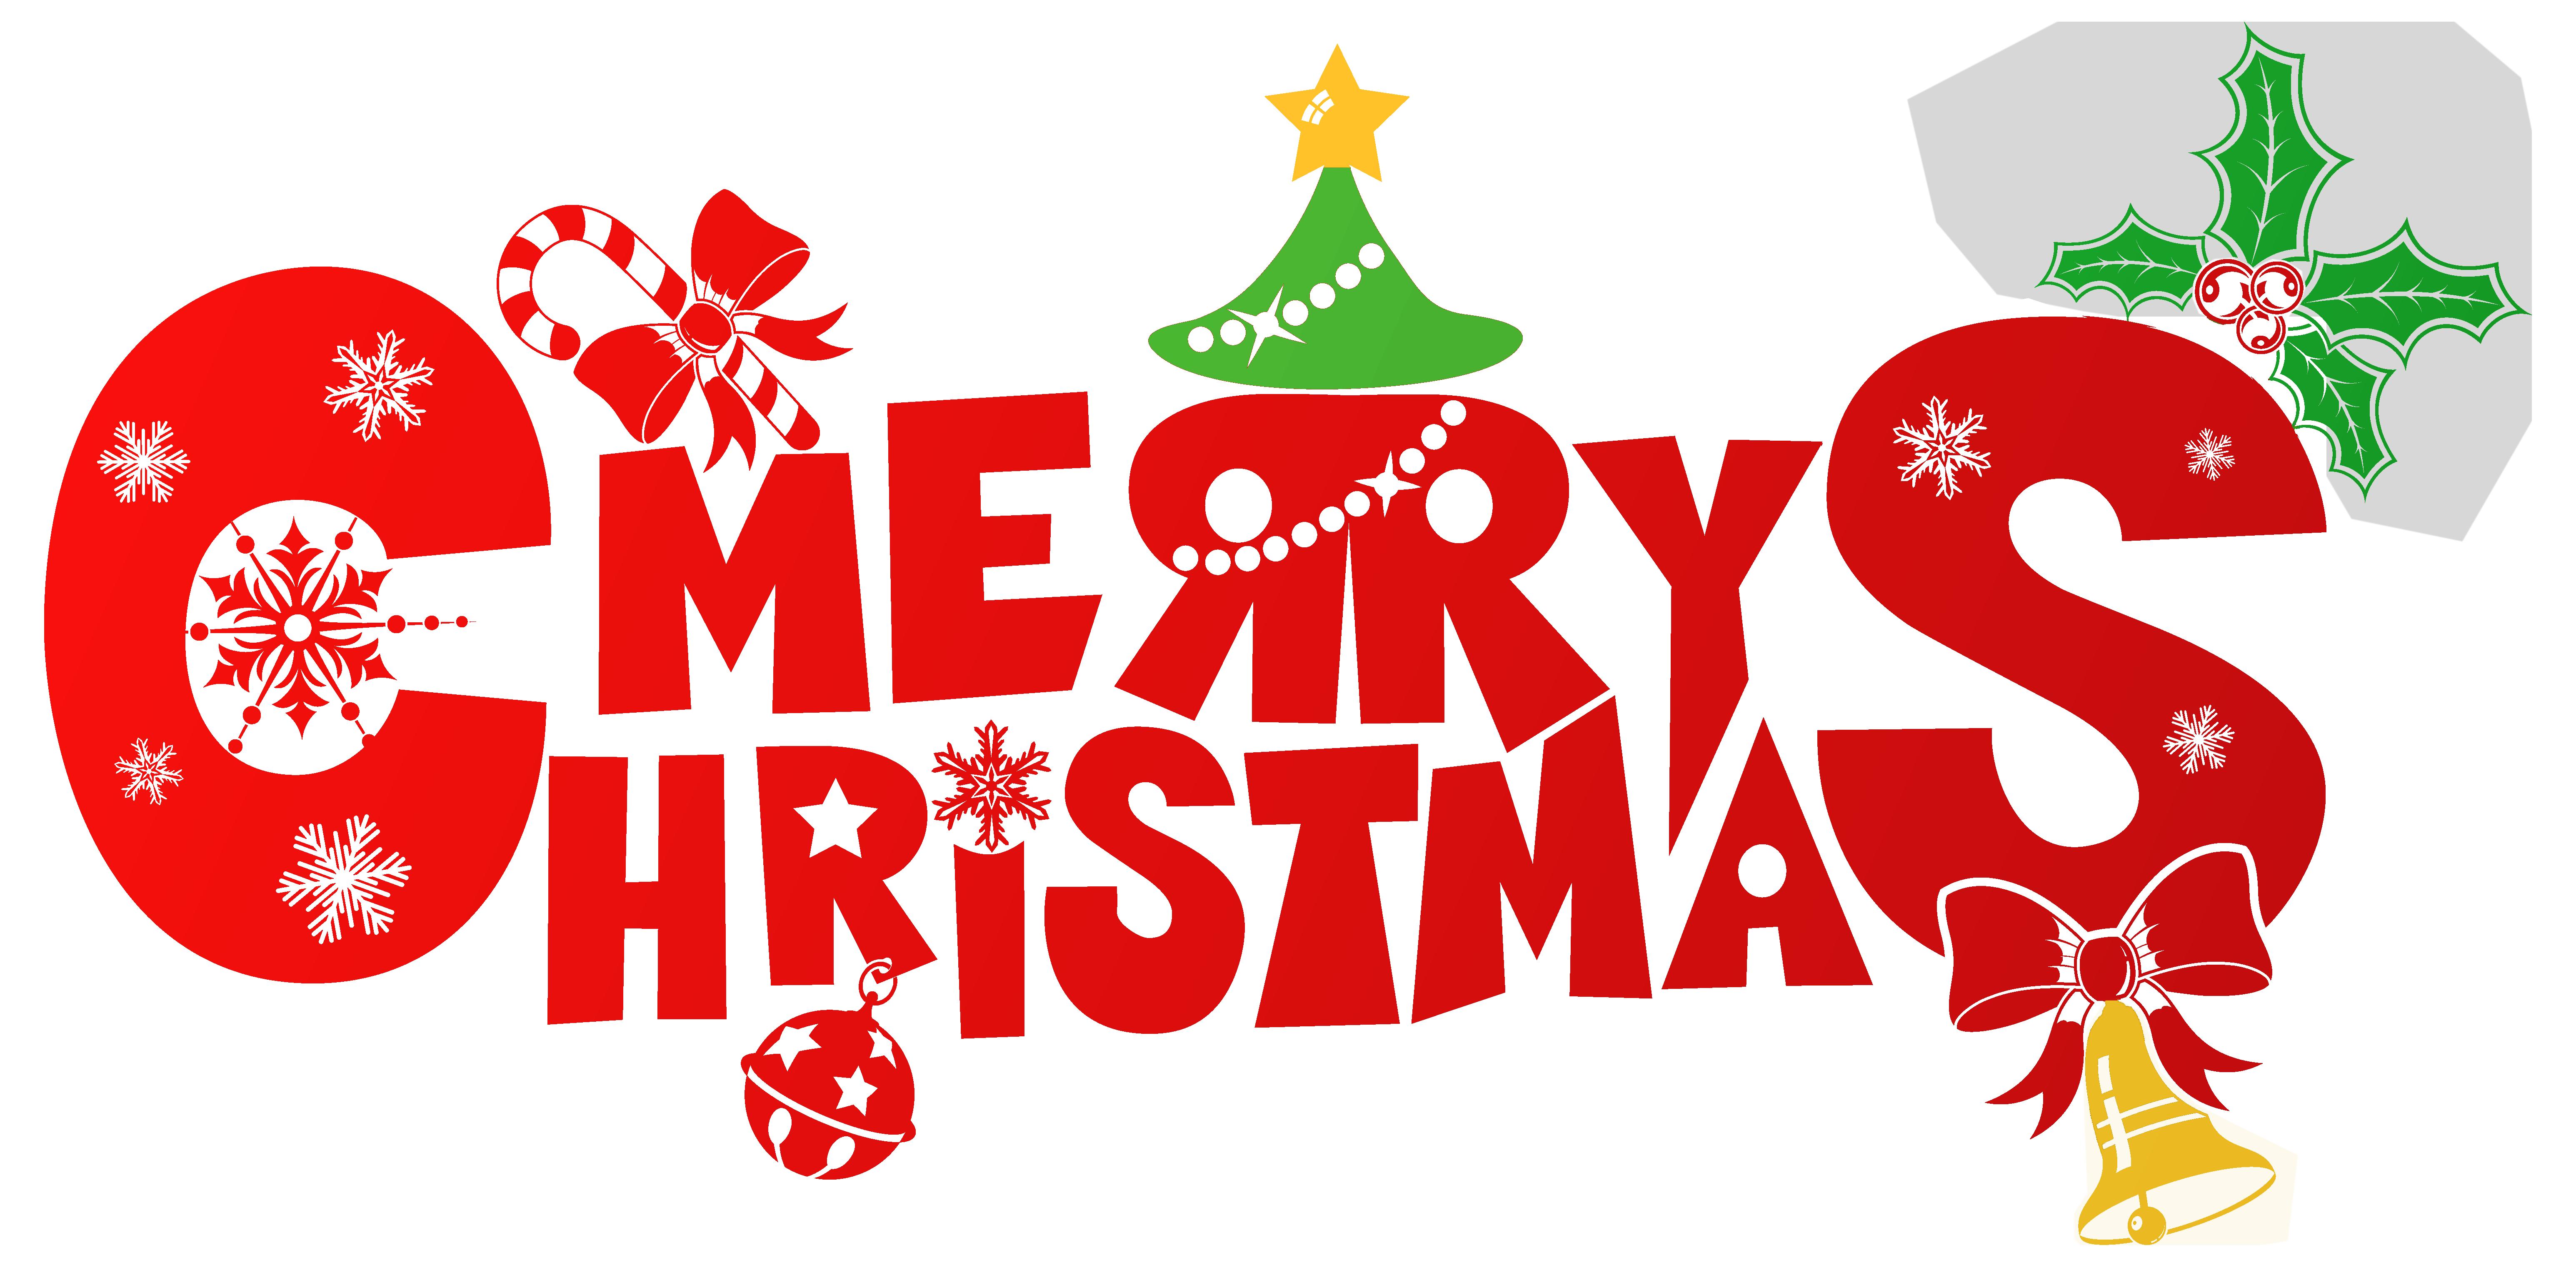 Free merry christmas.